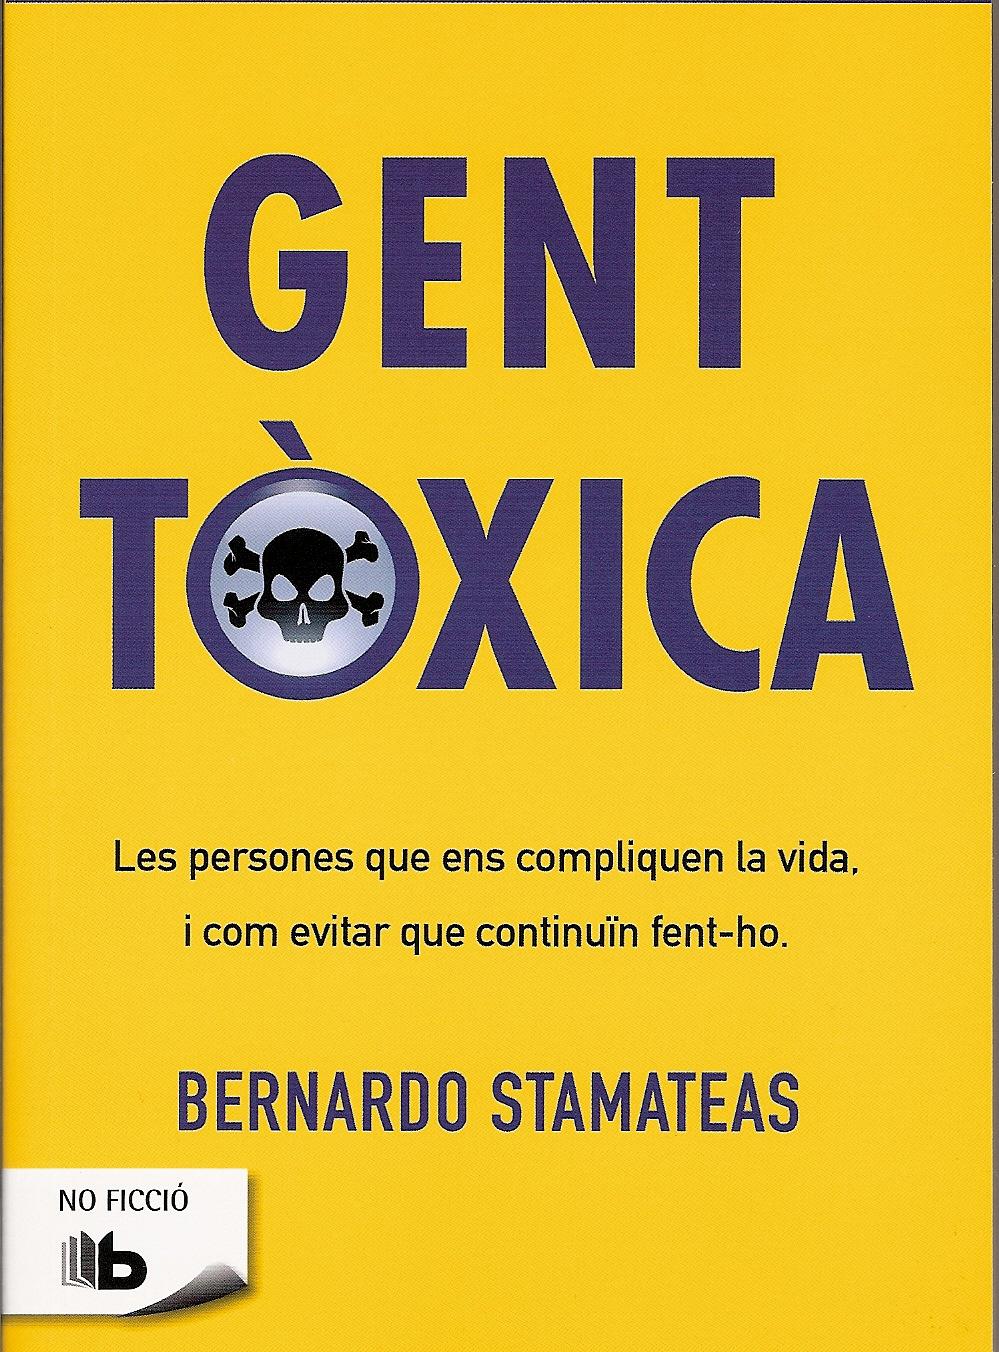 Gent tòxica